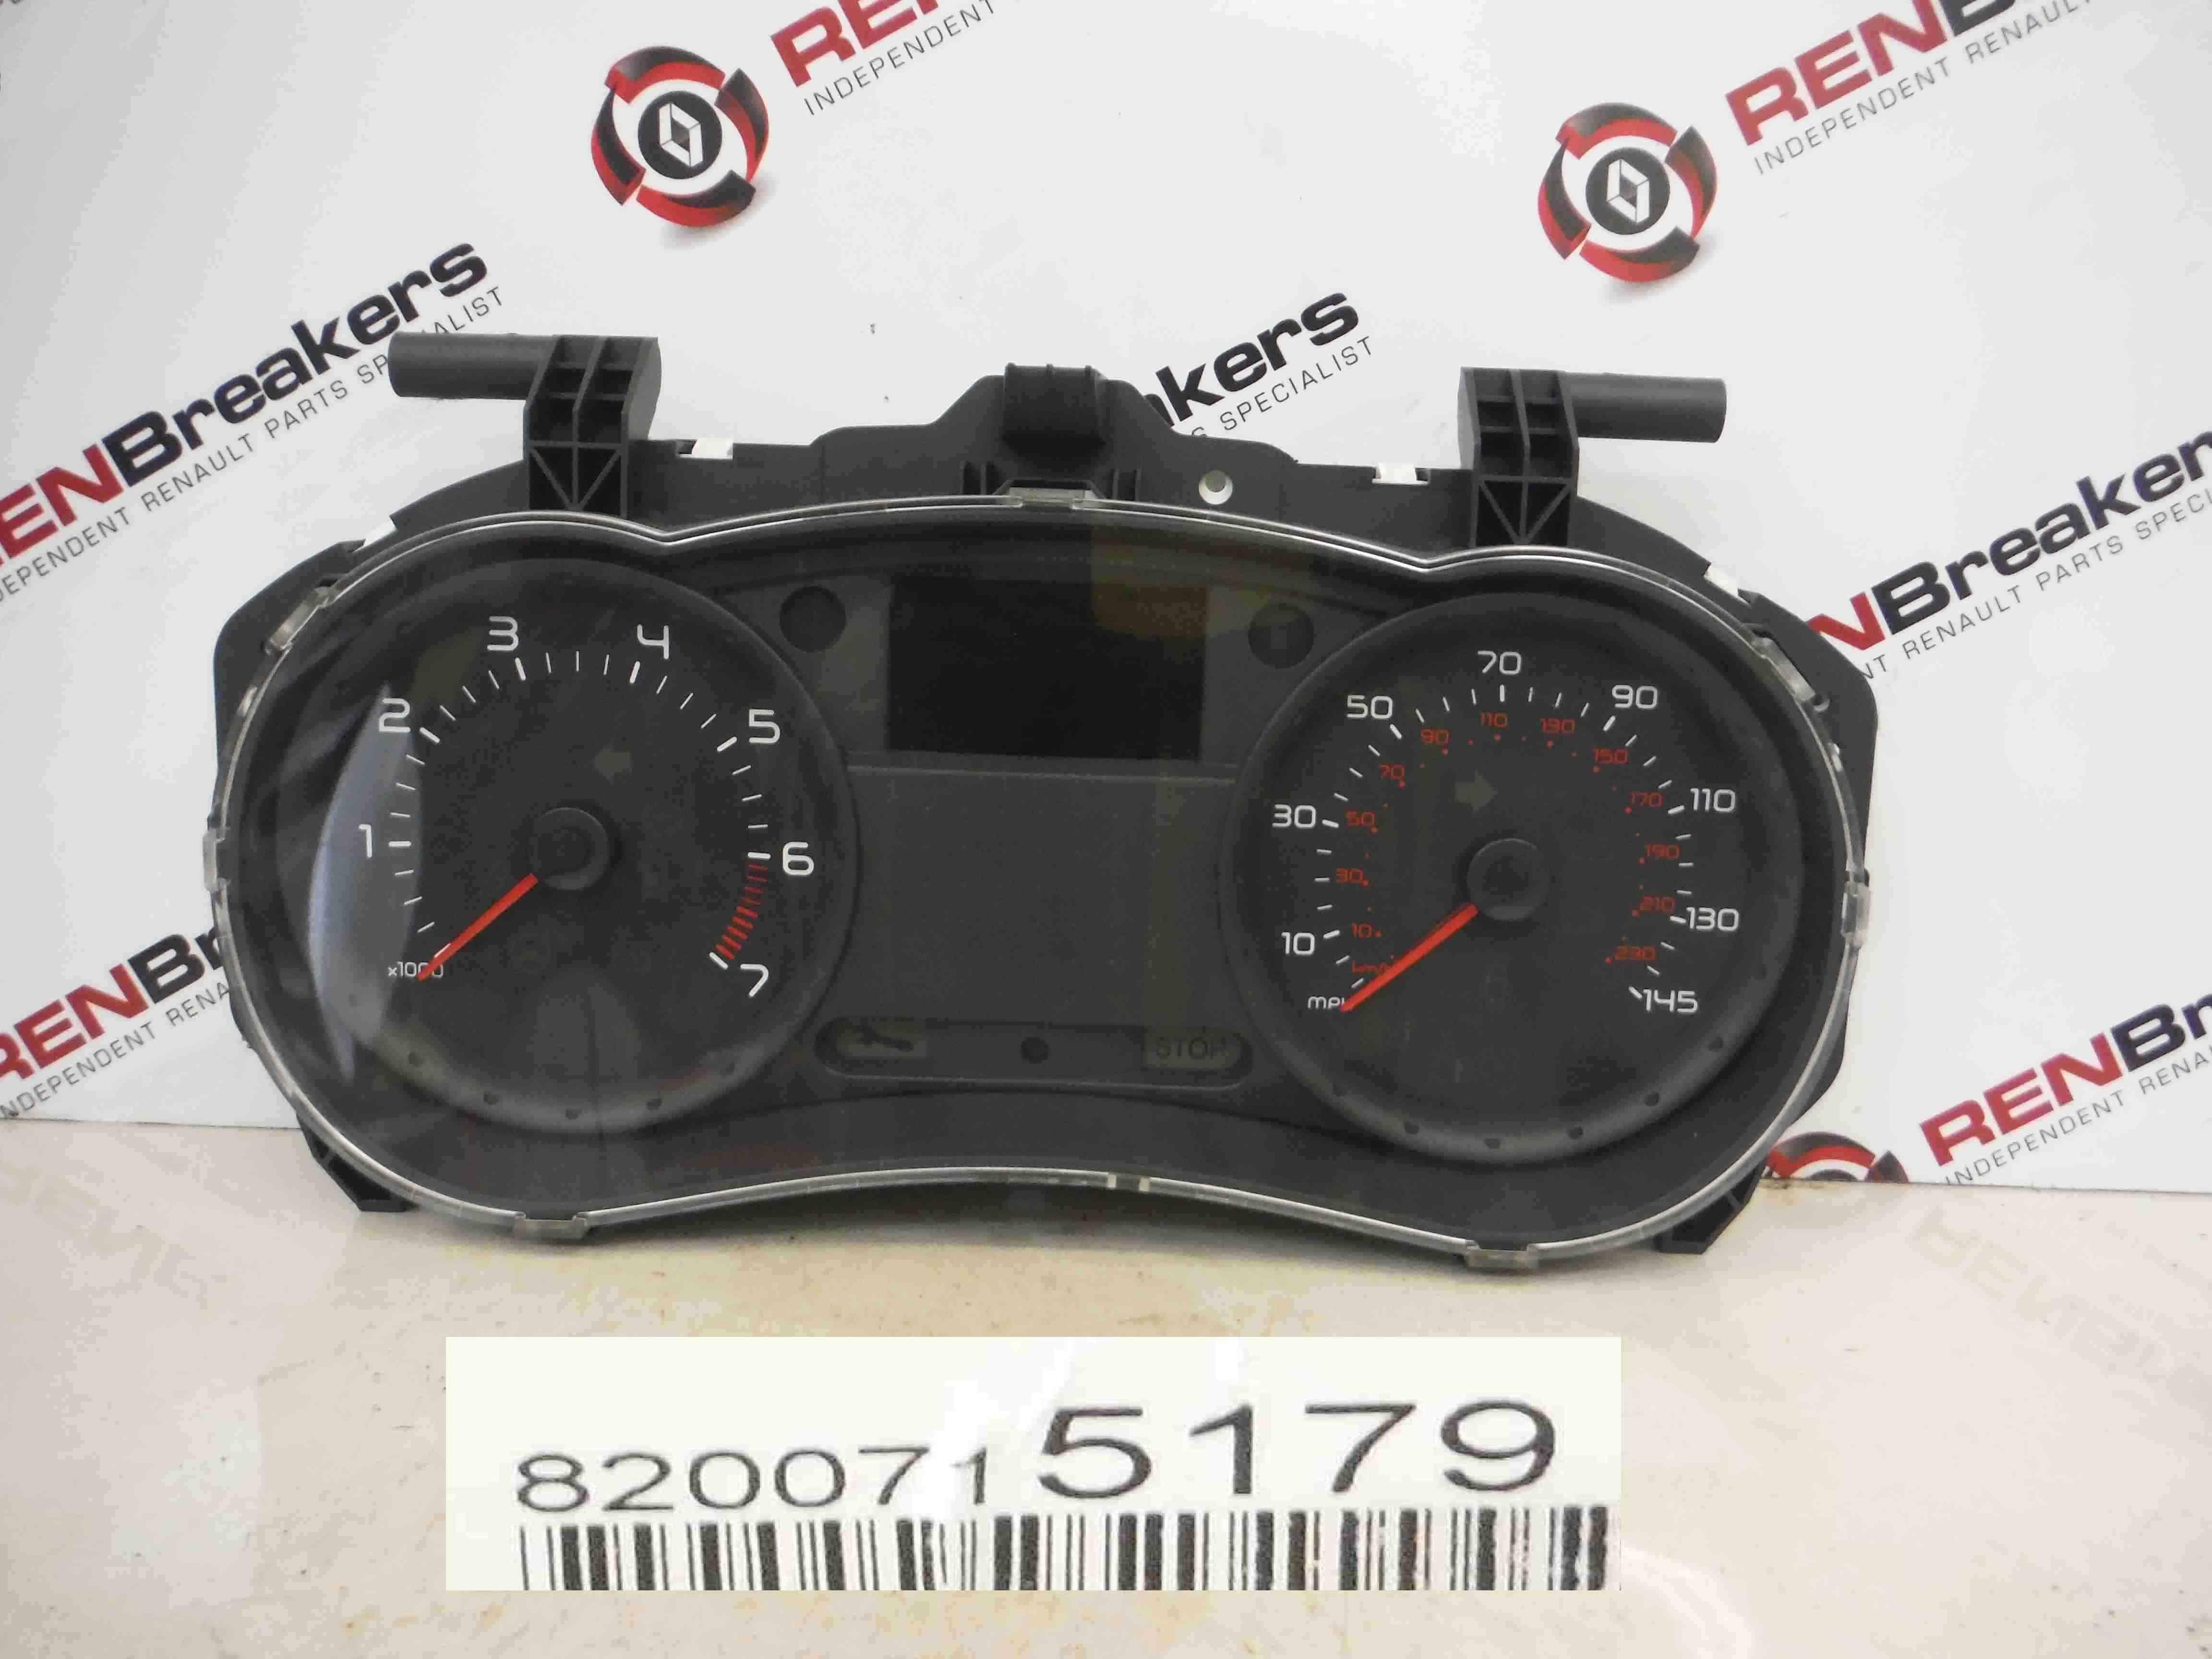 Renault Clio MK3 2005-2012 Instrument Panel Dials Clocks Gauges 81k 8200715179